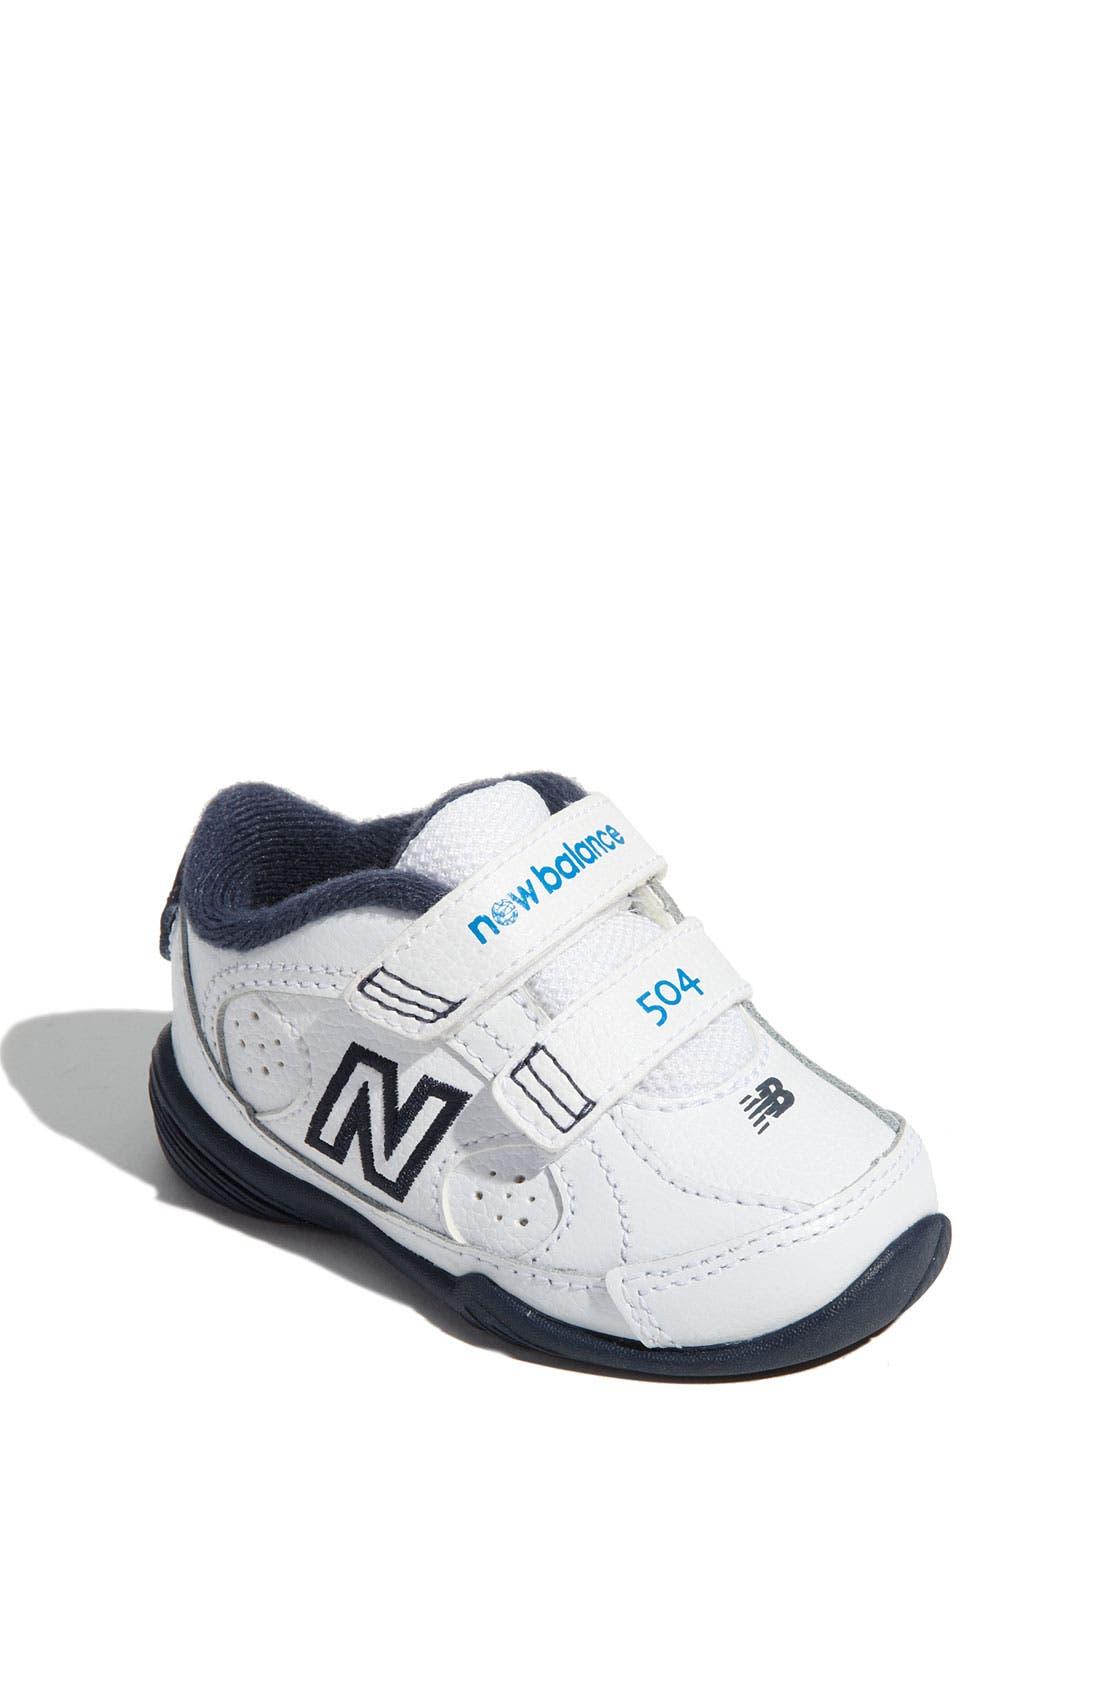 Alternate Image 1 Selected - New Balance '504' Sneaker (Baby, Walker & Toddler)